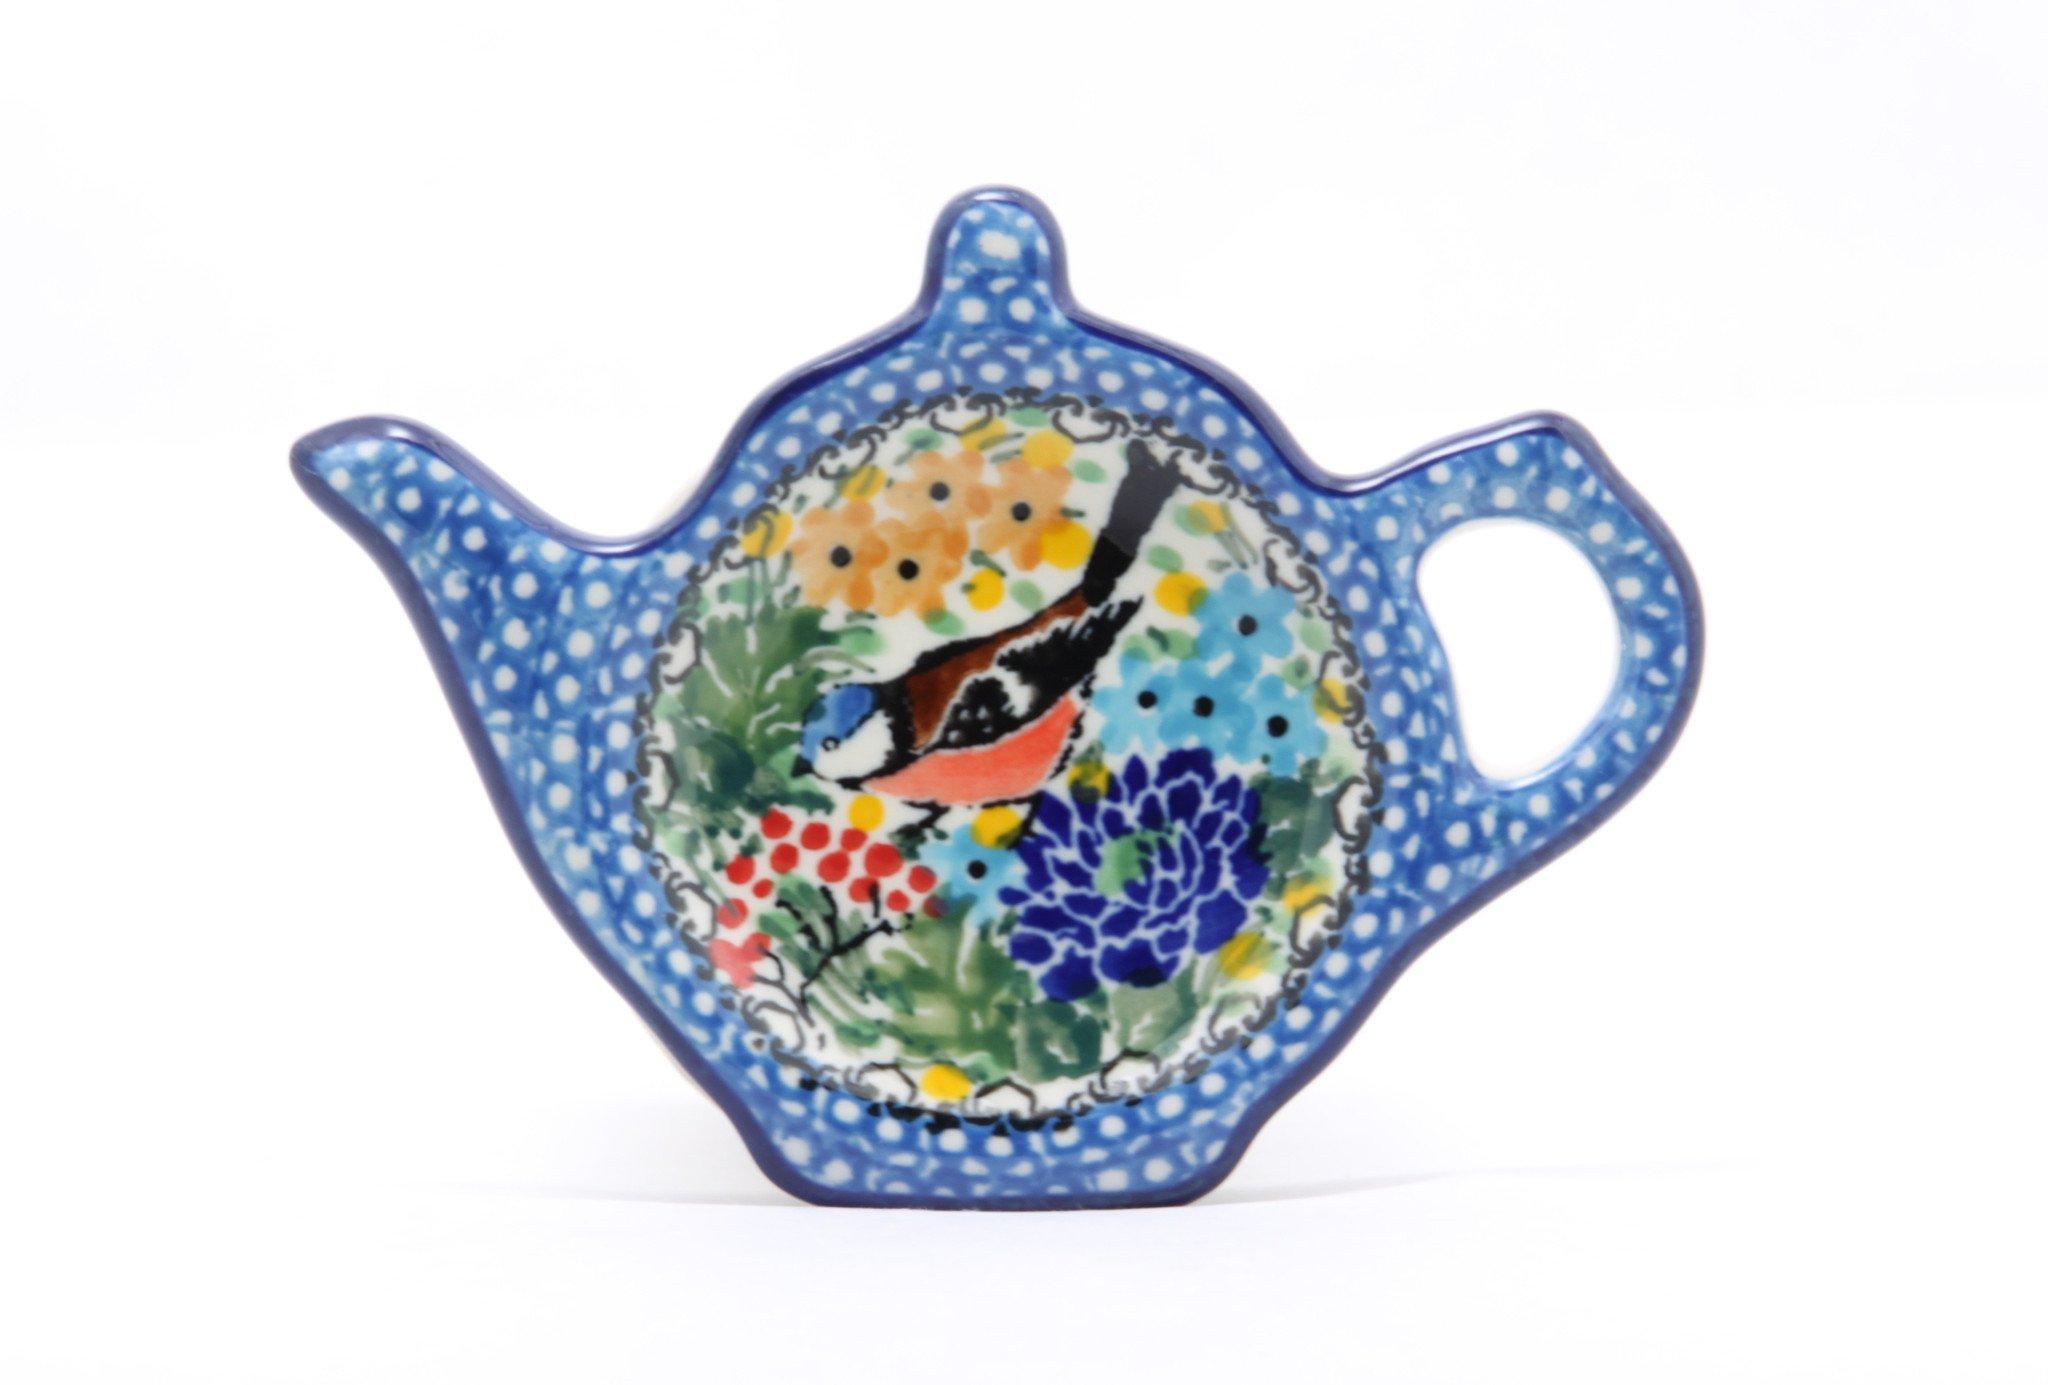 Polish Pottery Handmade Ceramic Tea Bag Plate Made in Poland by Ceramika Artystyczna